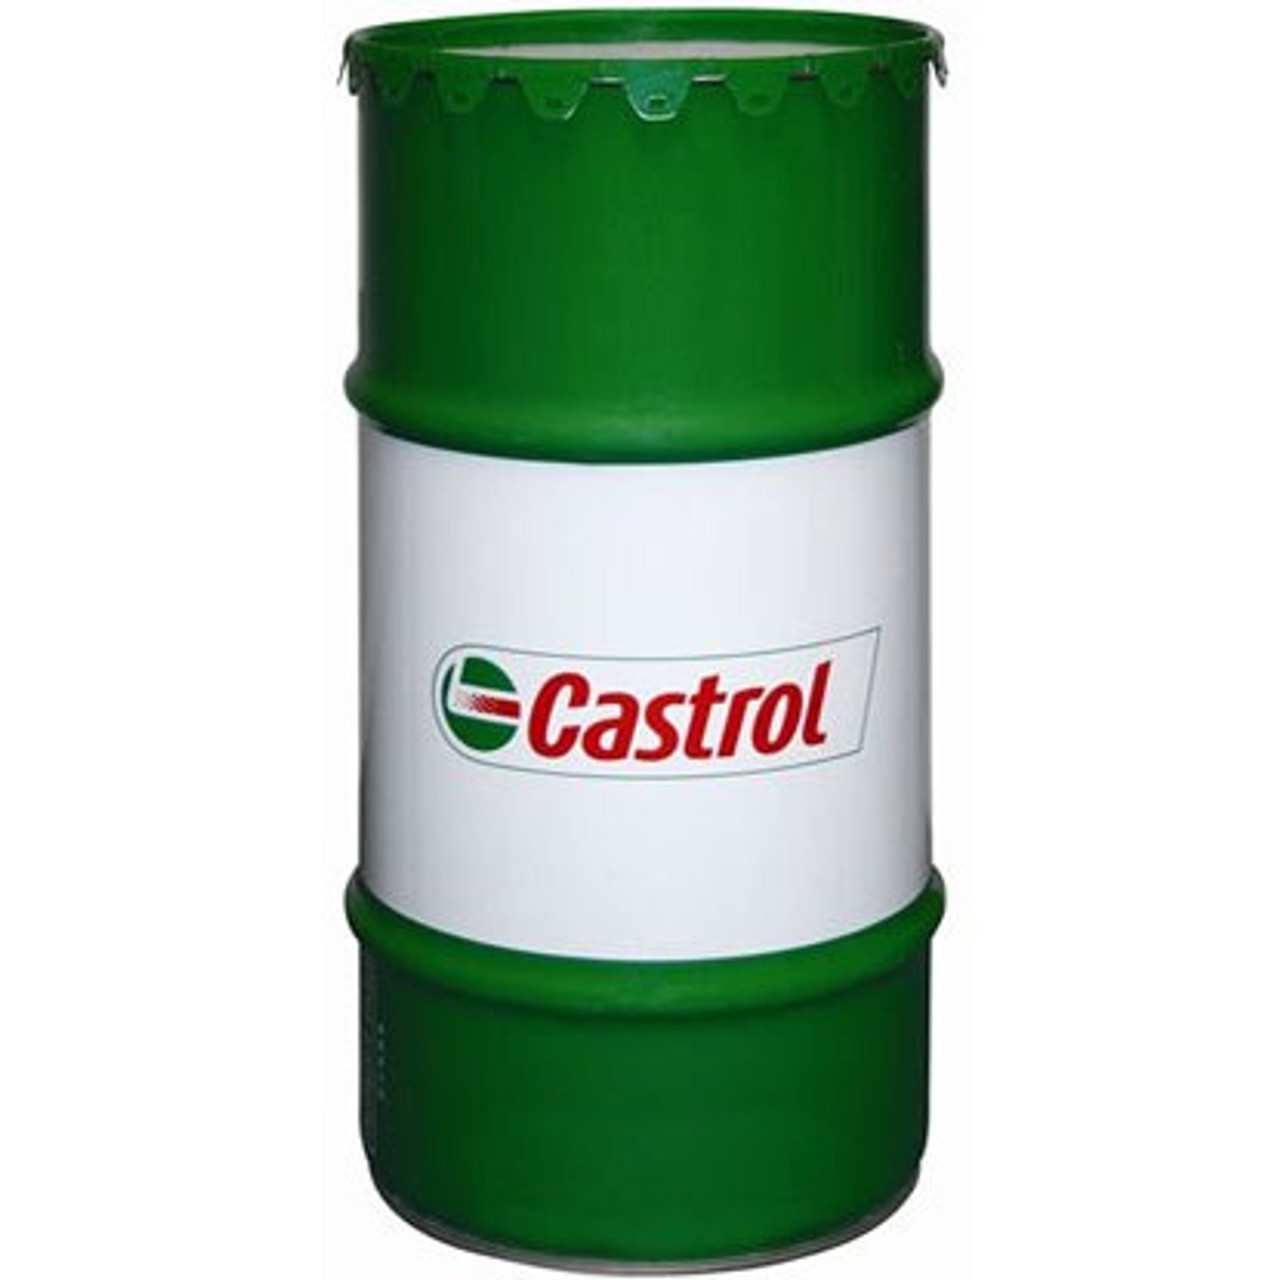 Castrol Molub-Alloy  OG 8031/6000-00 Open Gear Lubricant - 110LB Keg (Lined)